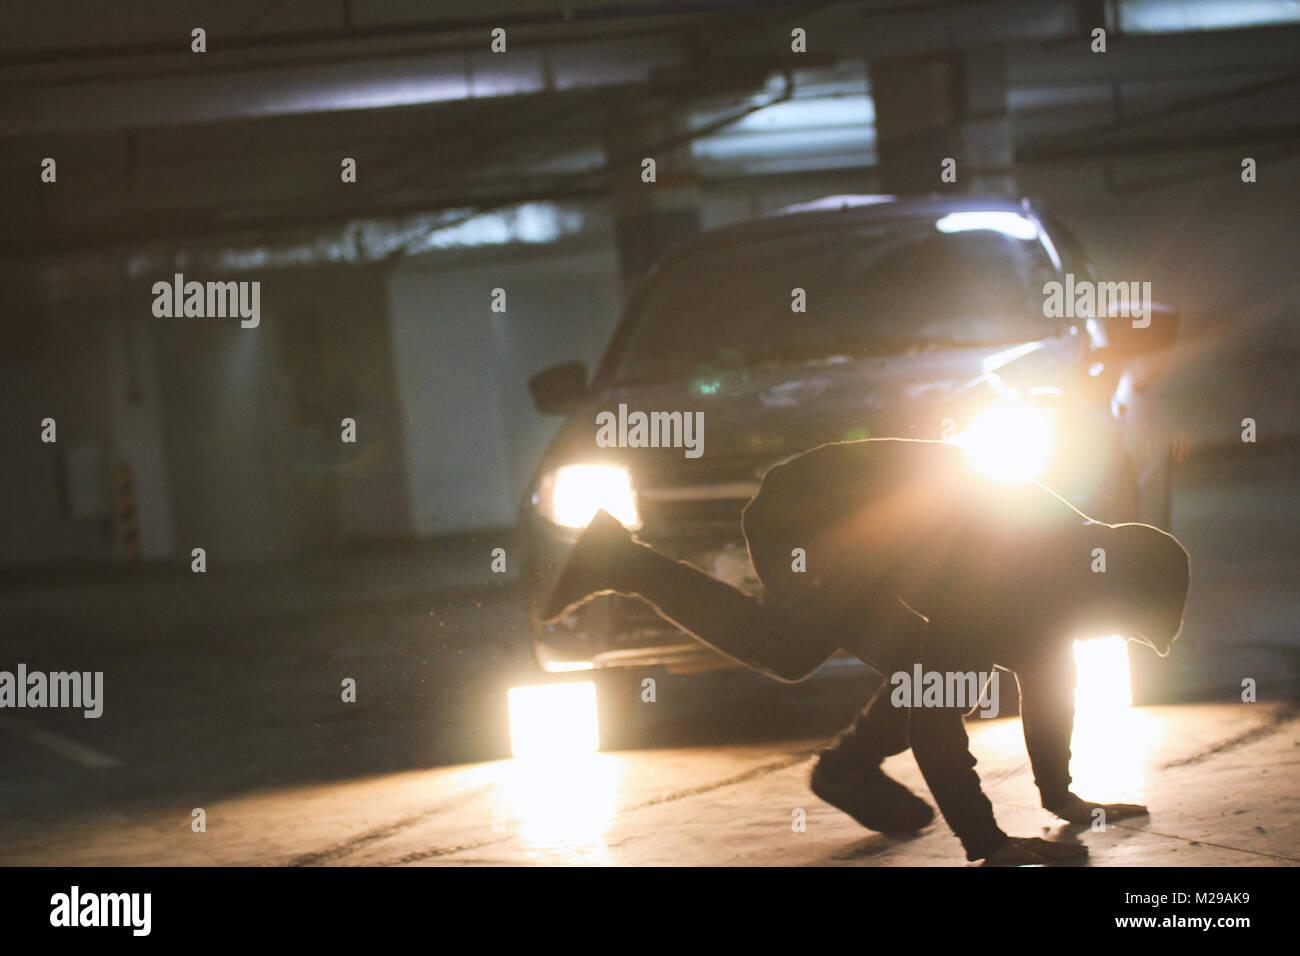 Man acrobat shows tricks somersault at underground parking - Stock Image